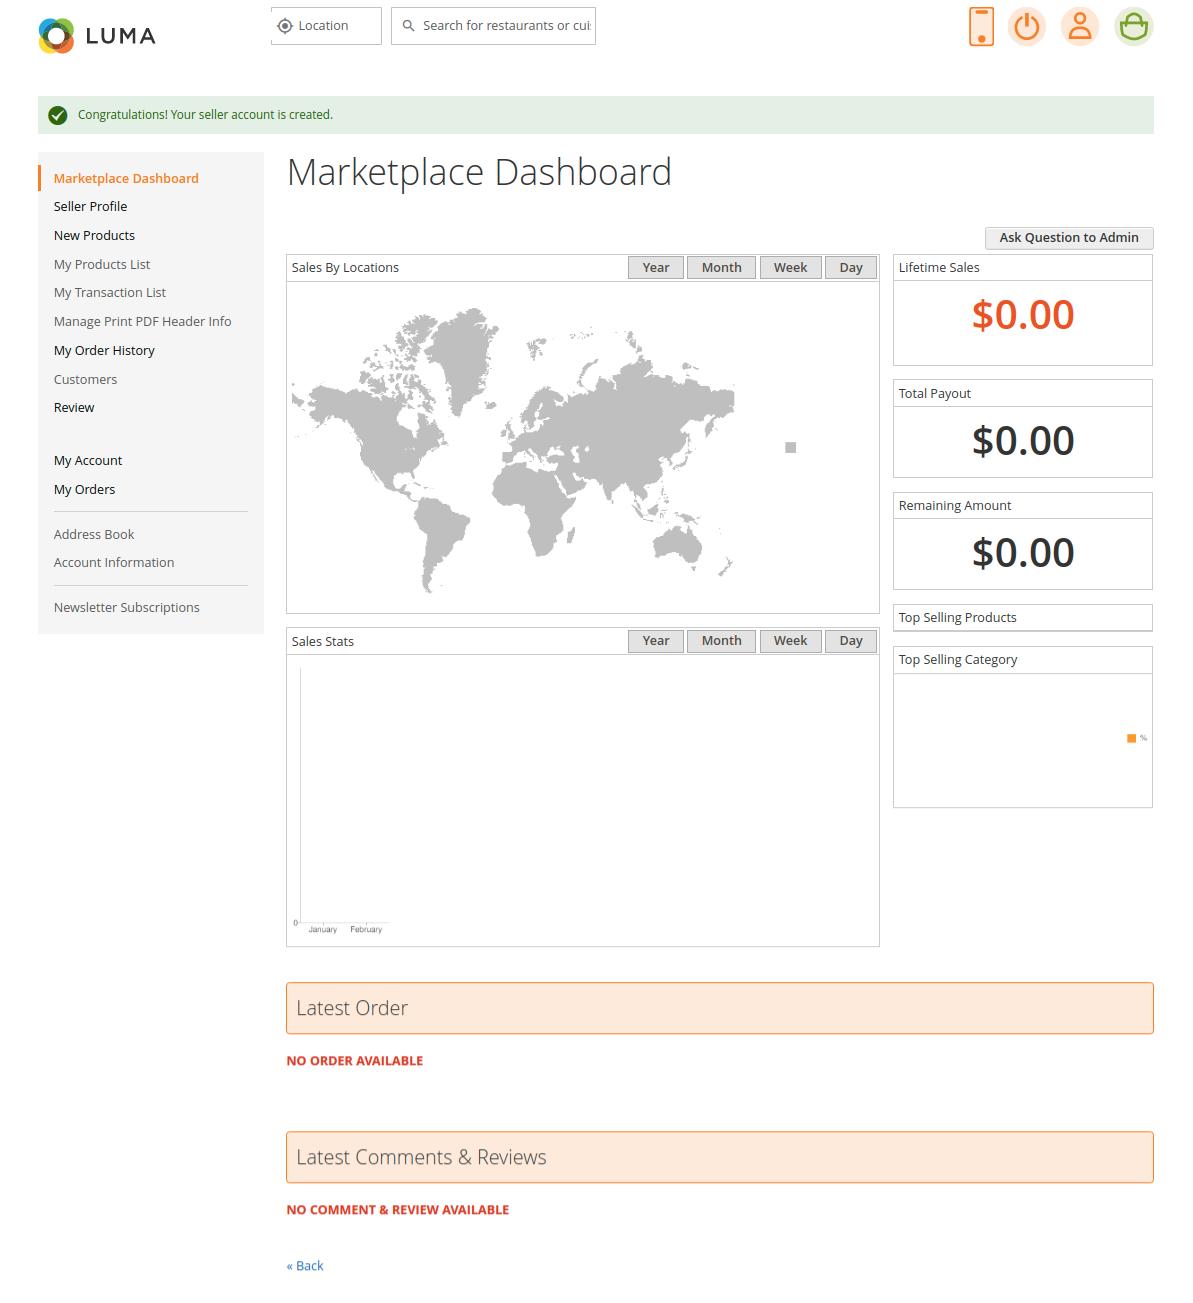 webkul-magento2-Online Food Delivery-seller-marketplace